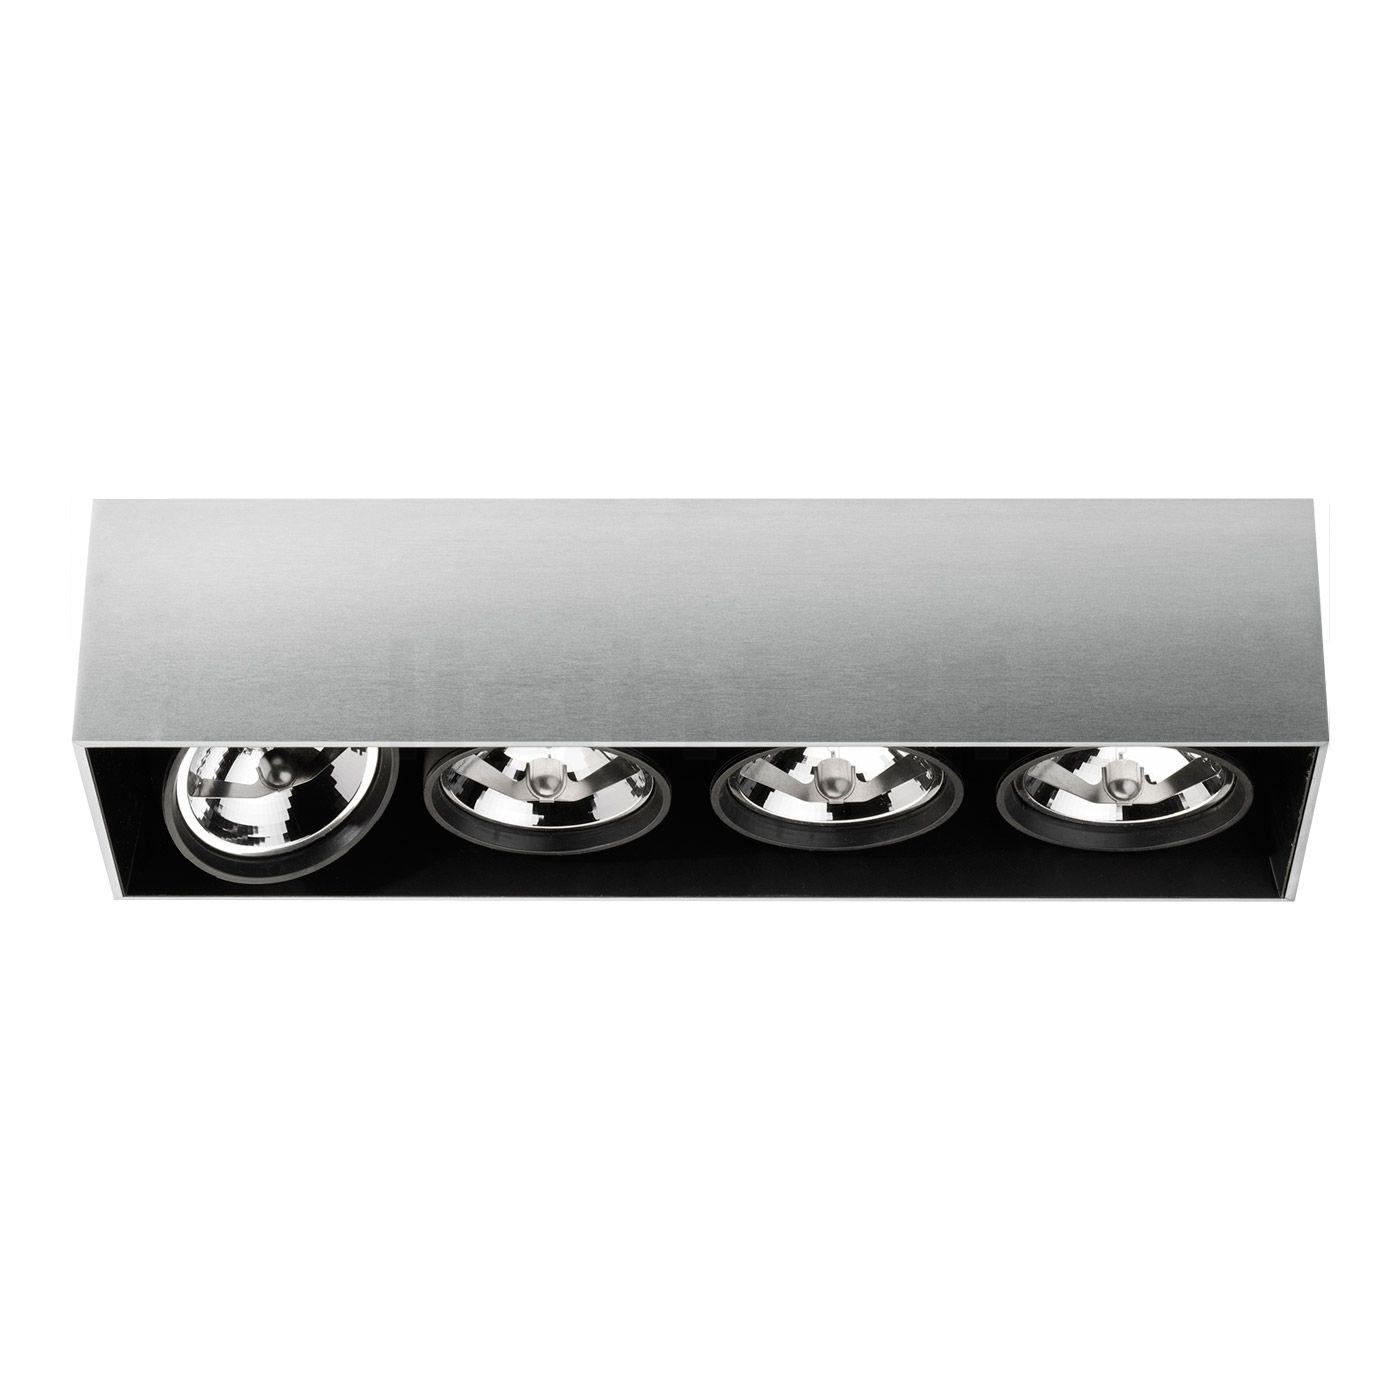 flos compass box 4 h135 qr111 ceiling lights. Black Bedroom Furniture Sets. Home Design Ideas